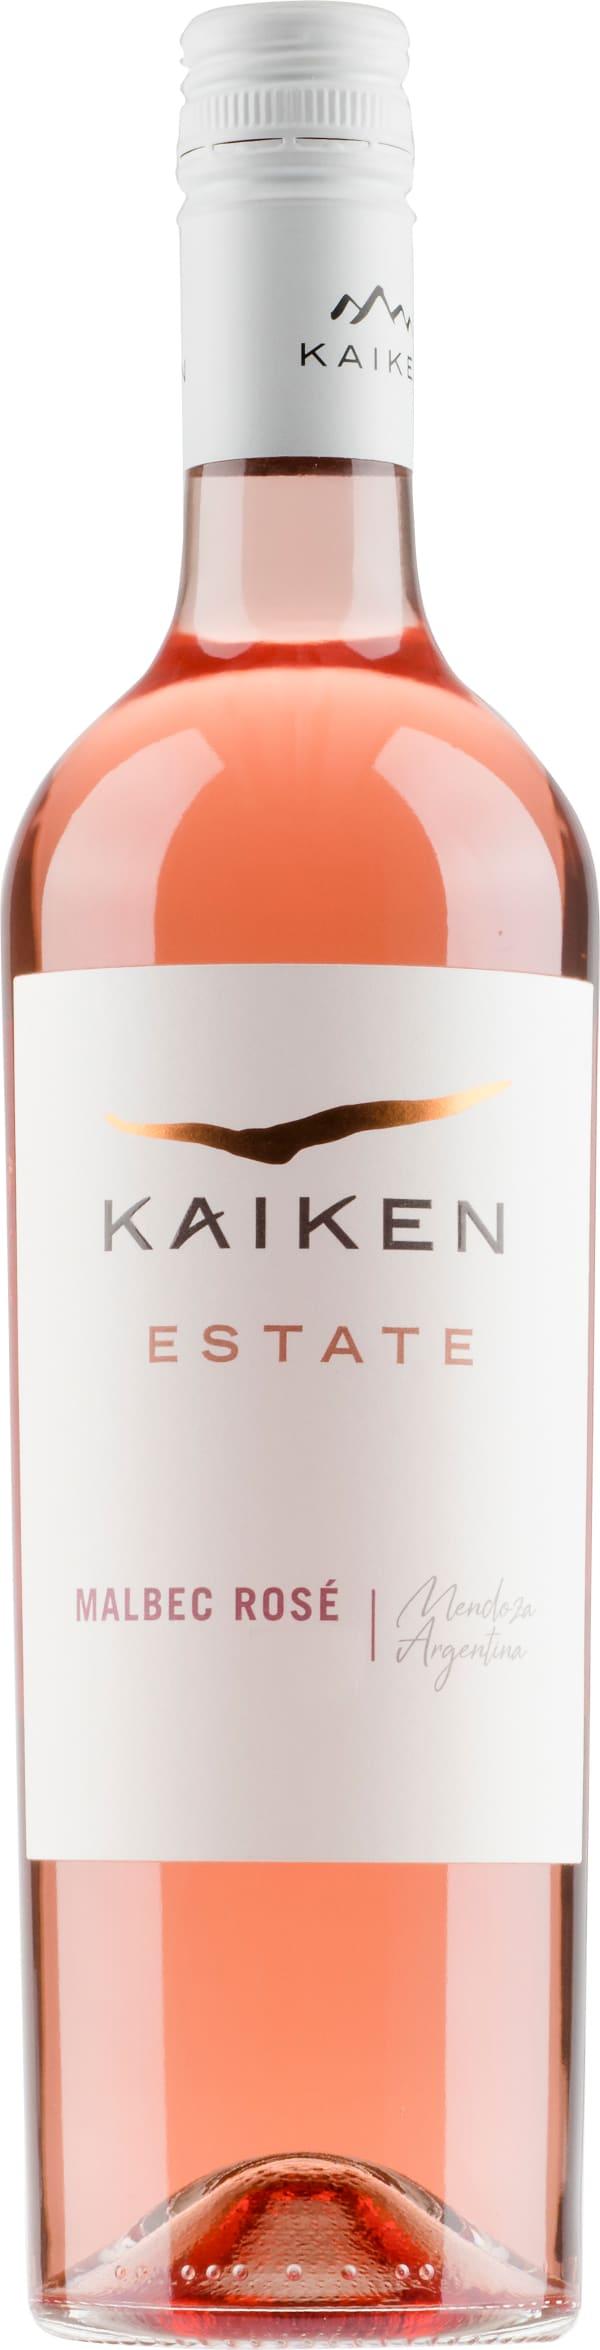 Kaiken Estate Malbec Rosé 2020